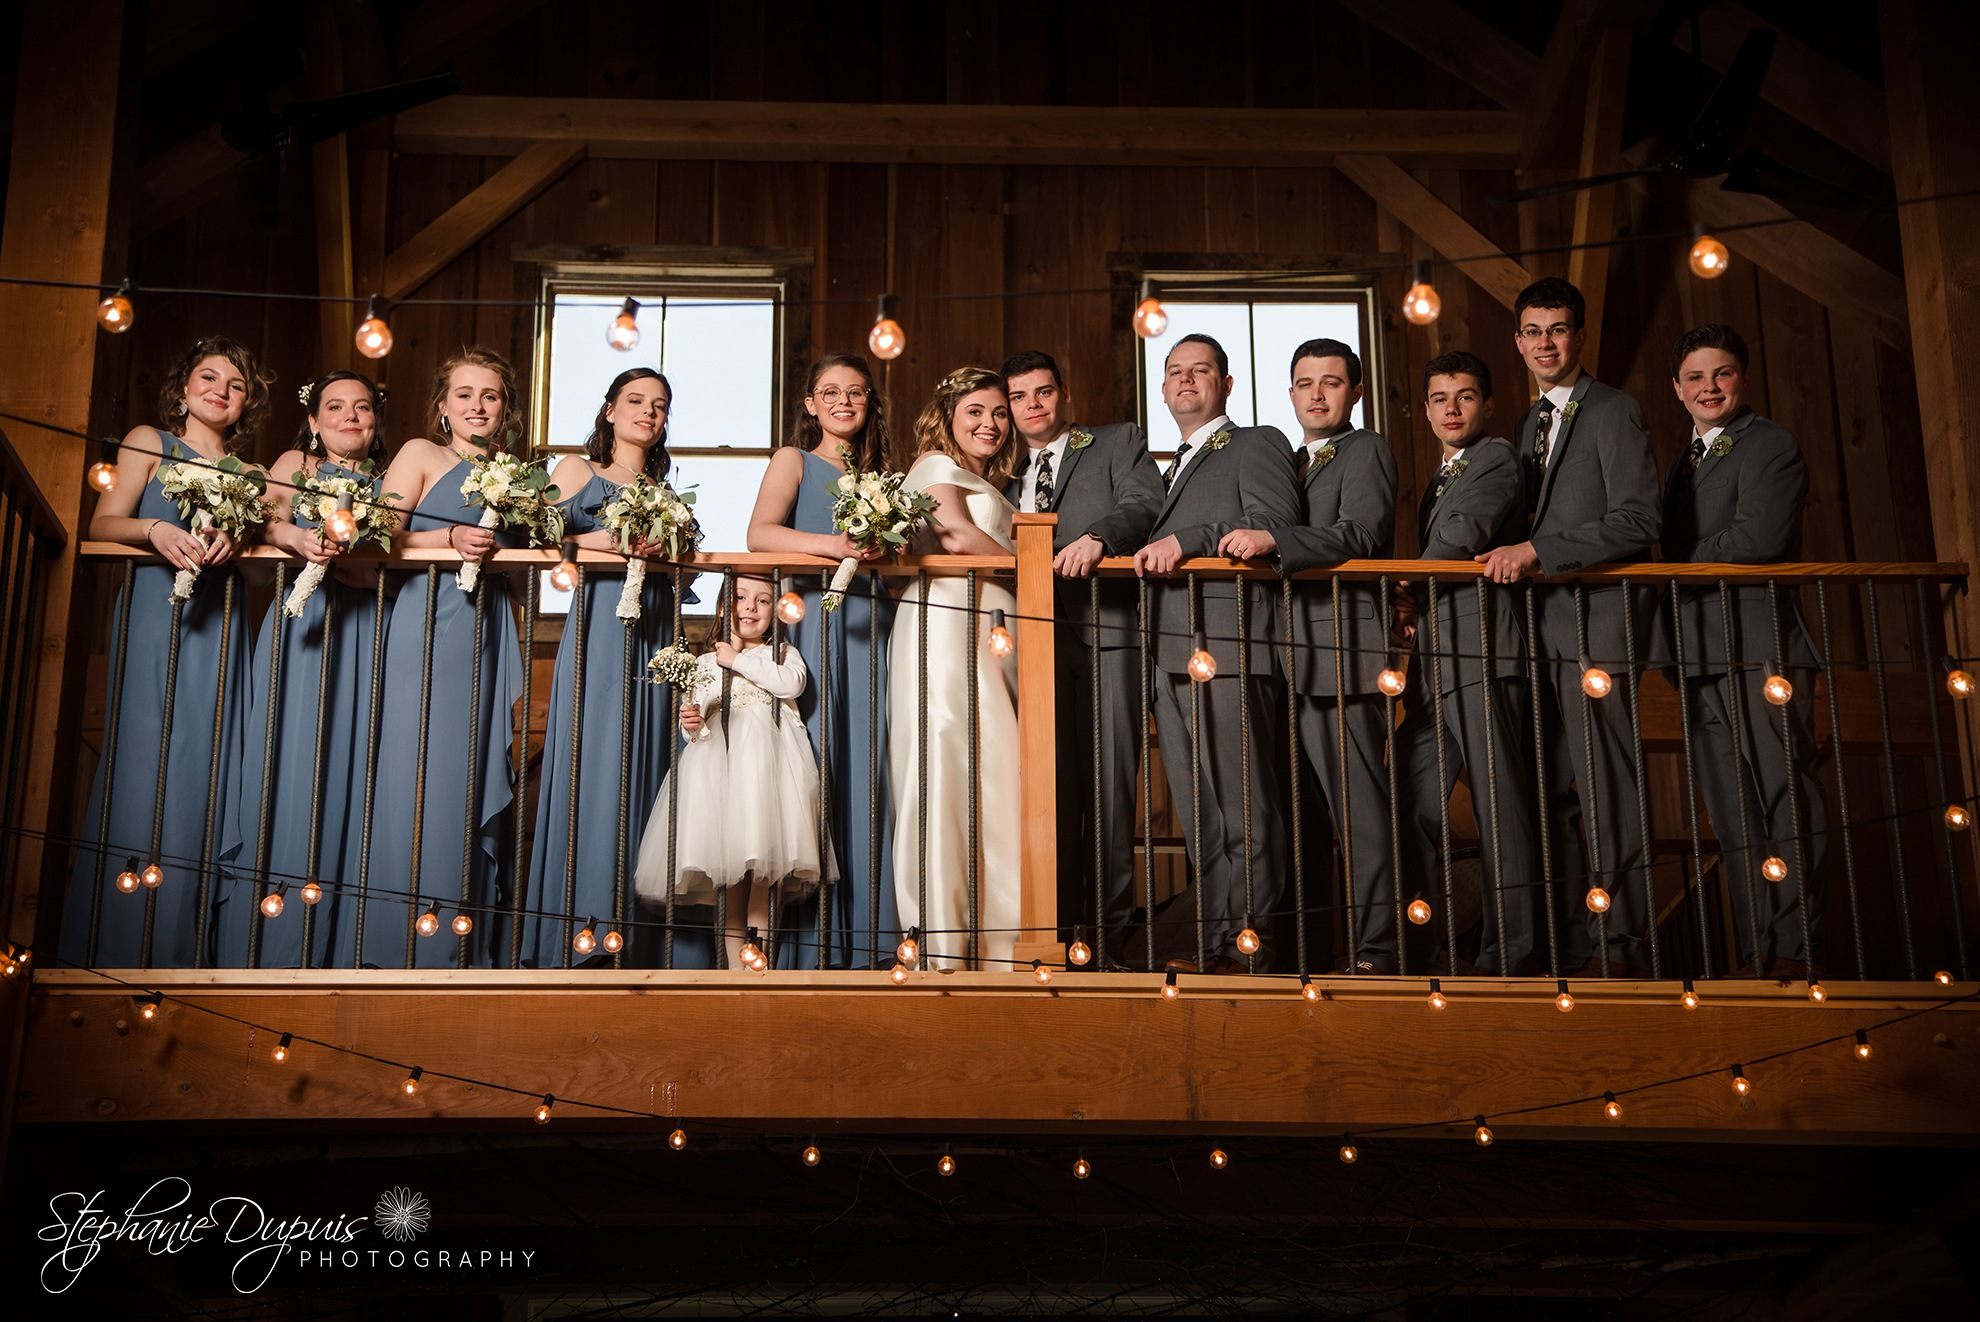 Lancaster Wedding Photographer 02 3 - Portfolio: Kittle Wedding